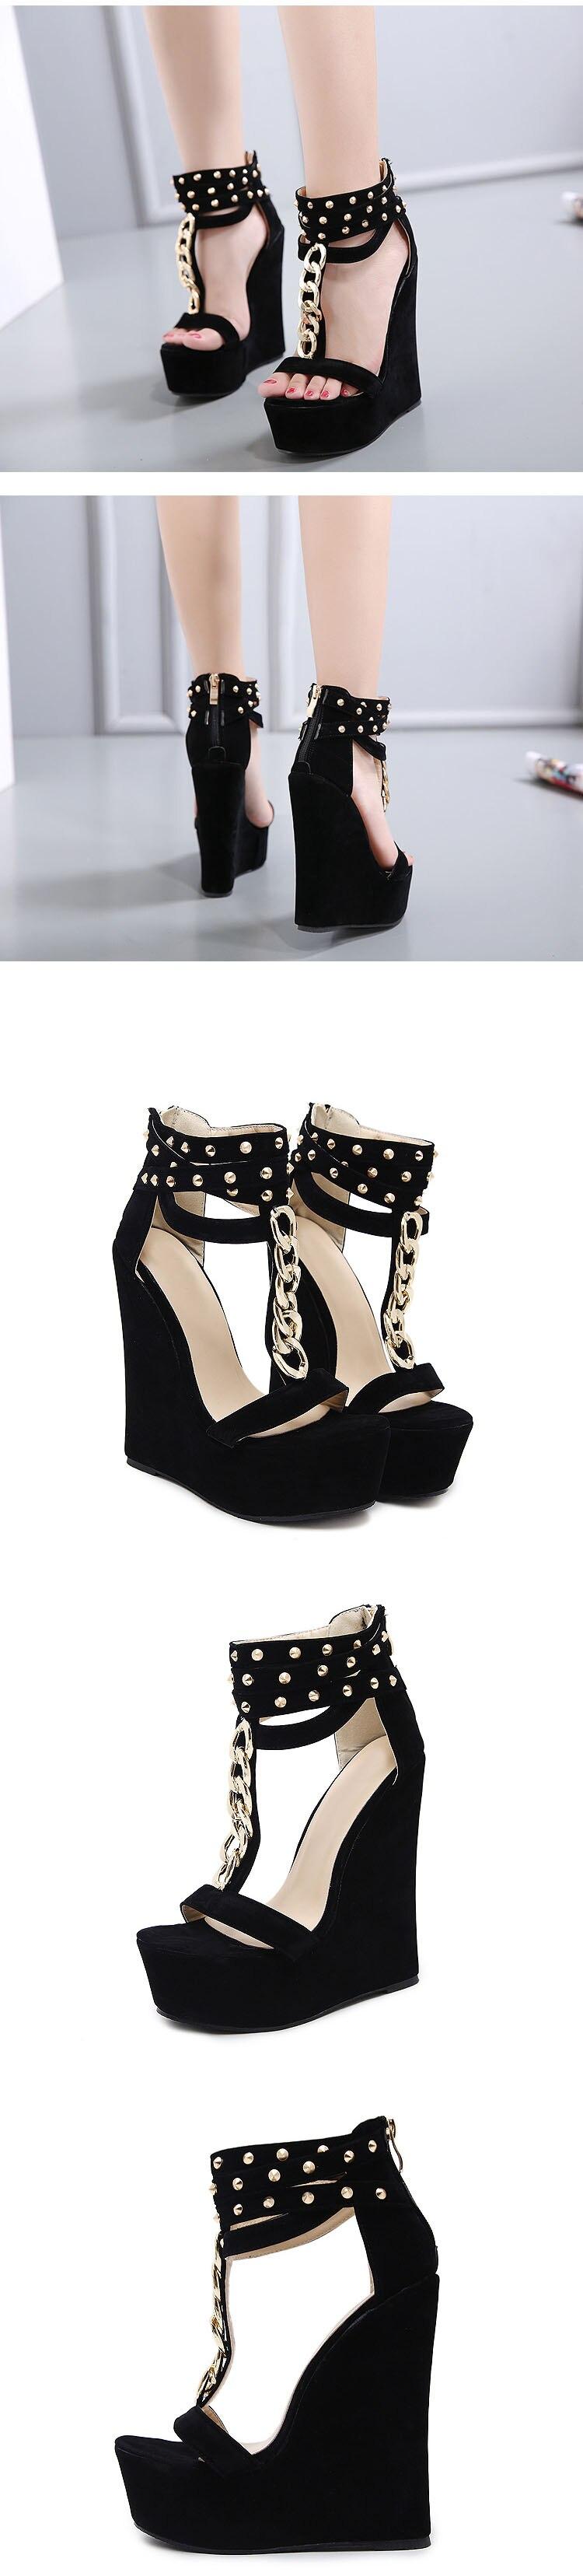 Gladiator Women Sandals High Heel Sandals